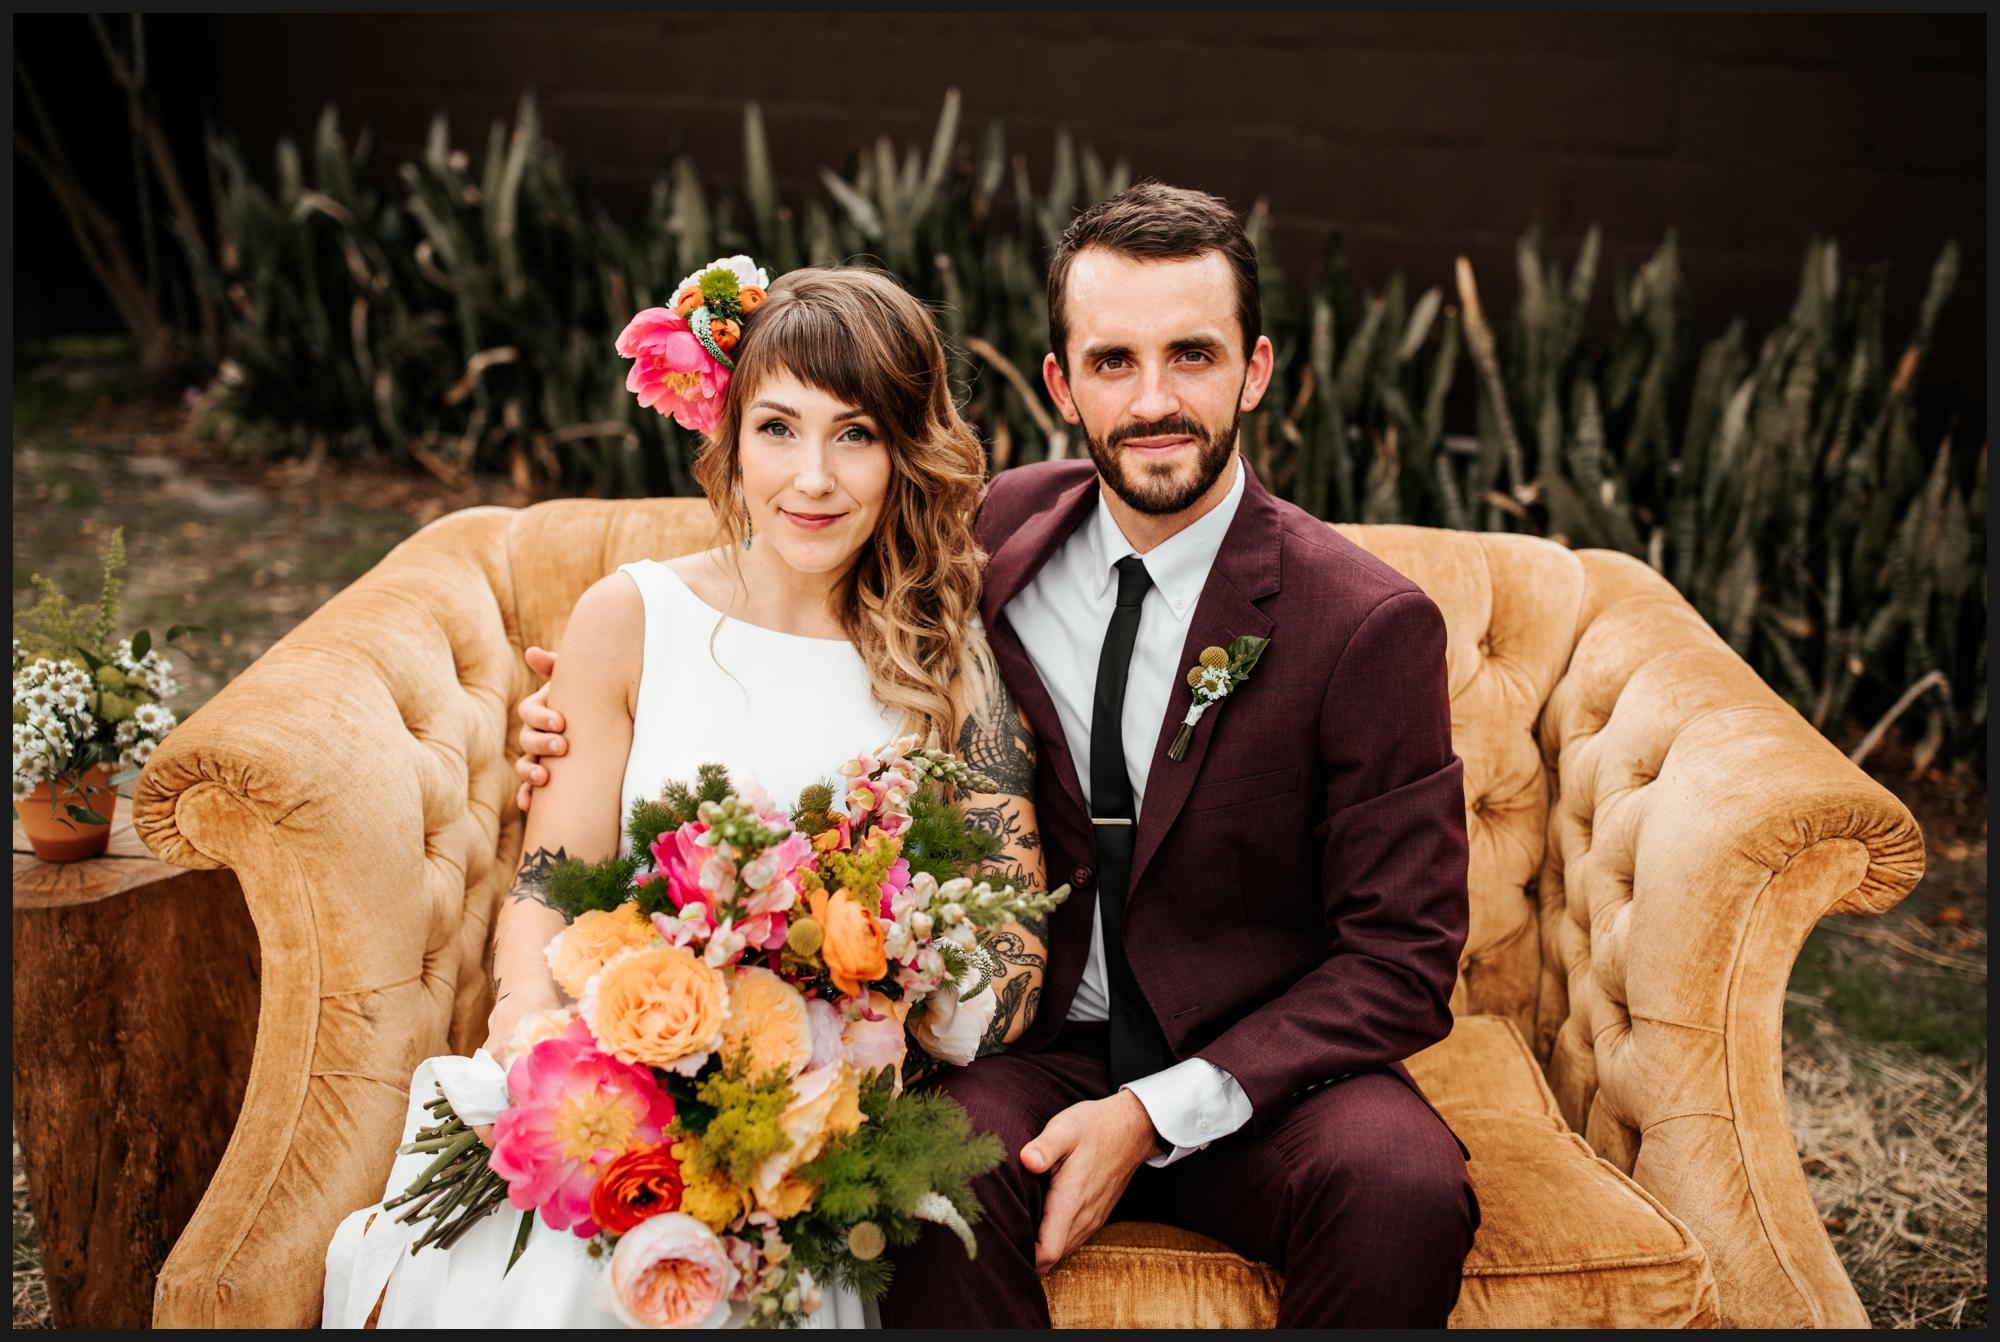 Orlando-Wedding-Photographer-destination-wedding-photographer-florida-wedding-photographer-bohemian-wedding-photographer_1991.jpg